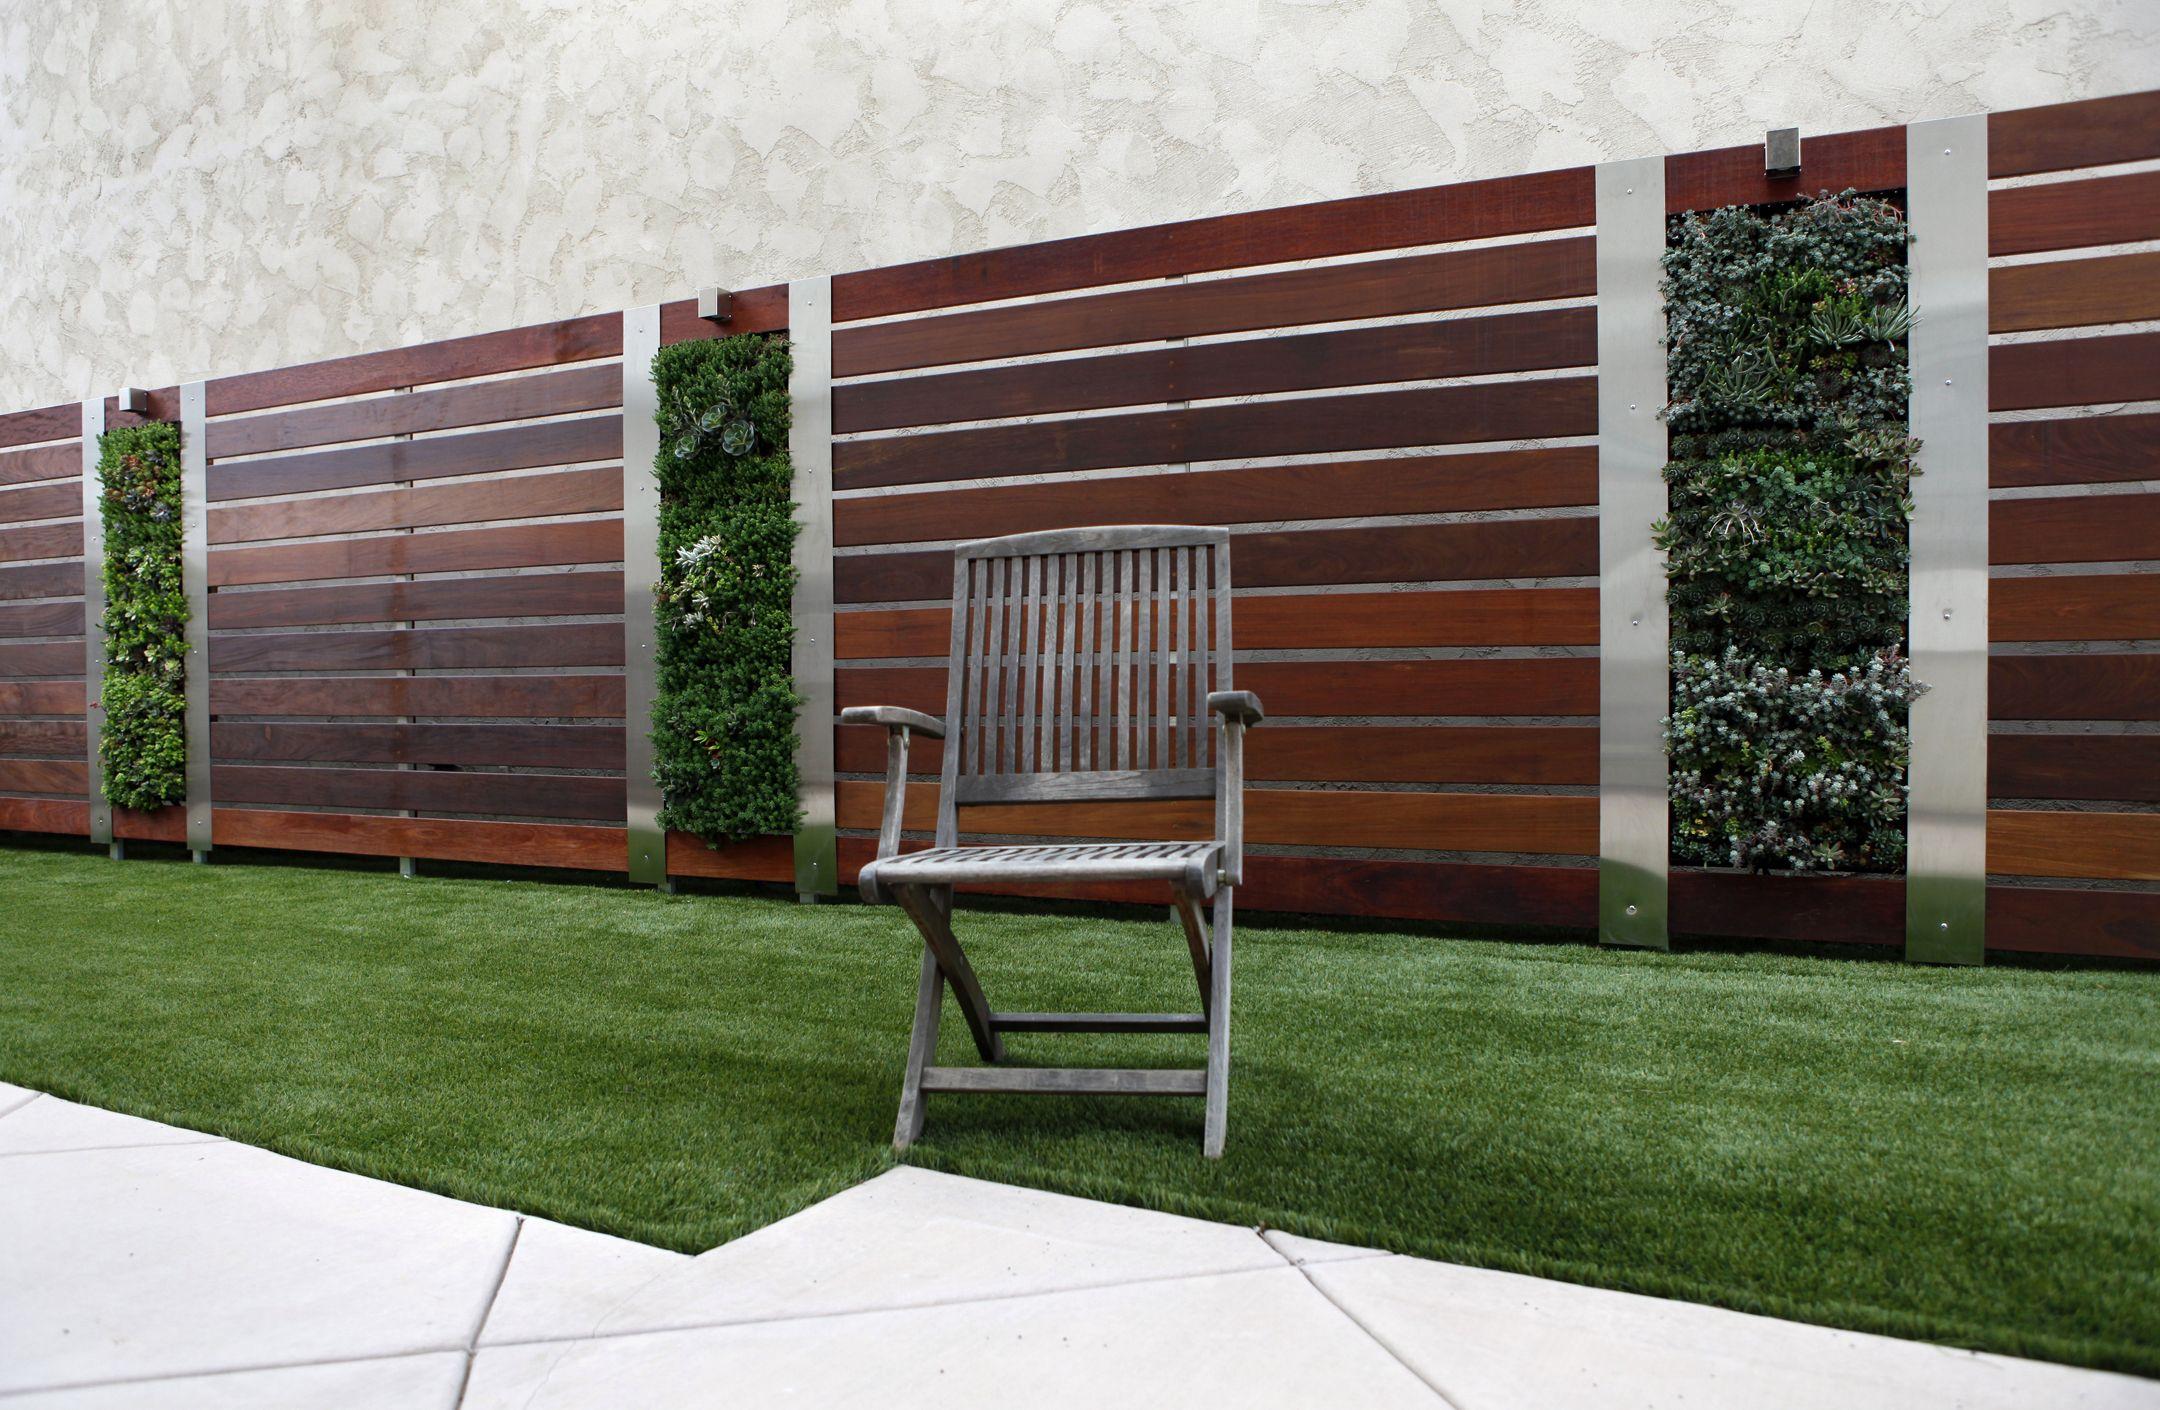 choisir une cl ture de jardin appropri e votre propri t jardin pinterest jardins. Black Bedroom Furniture Sets. Home Design Ideas